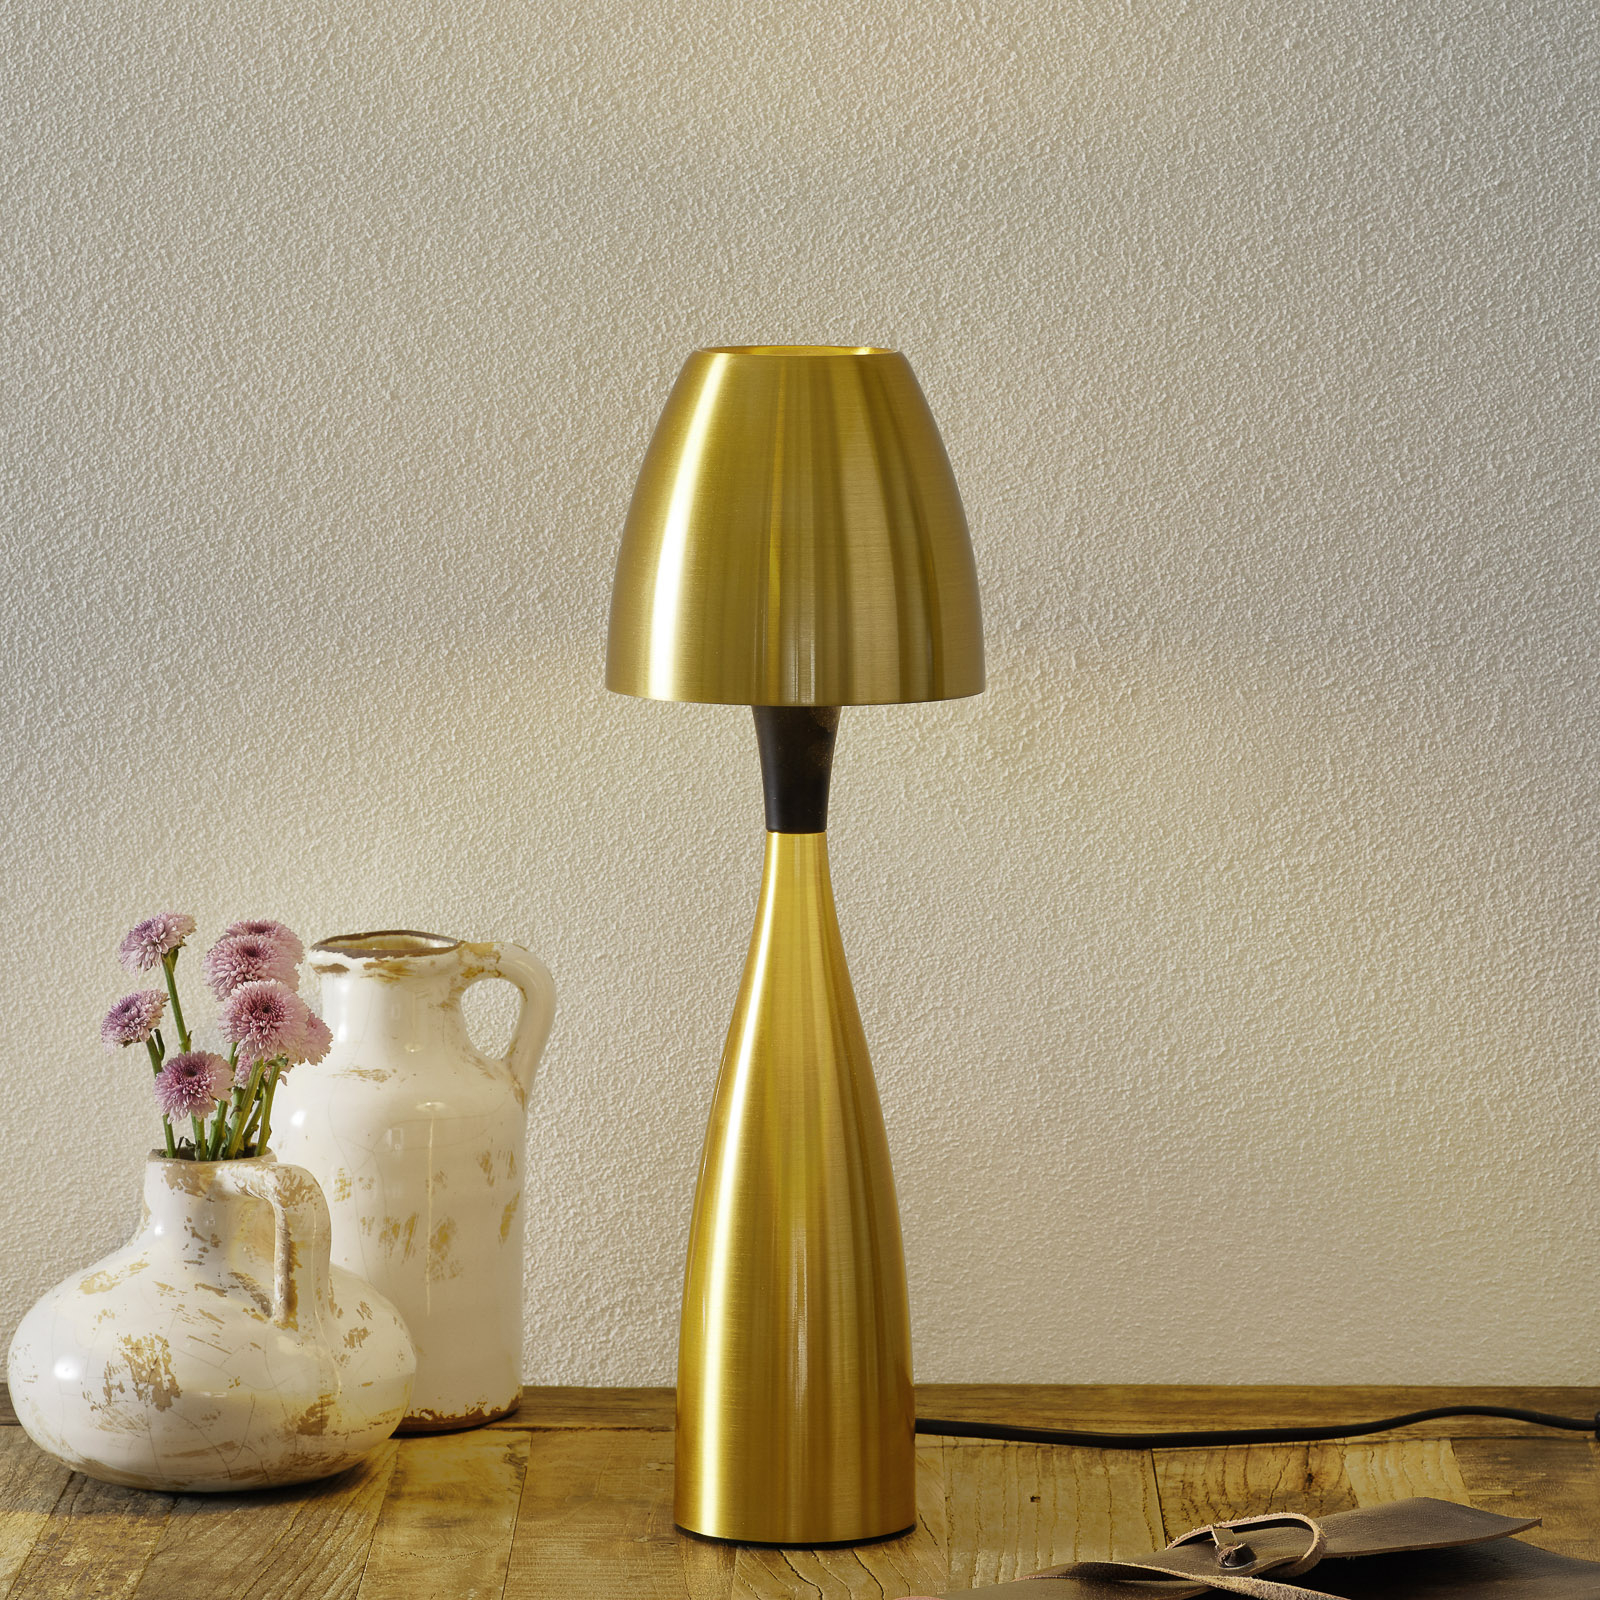 Messingkleurige LED tafellamp Anemon 38,9 cm